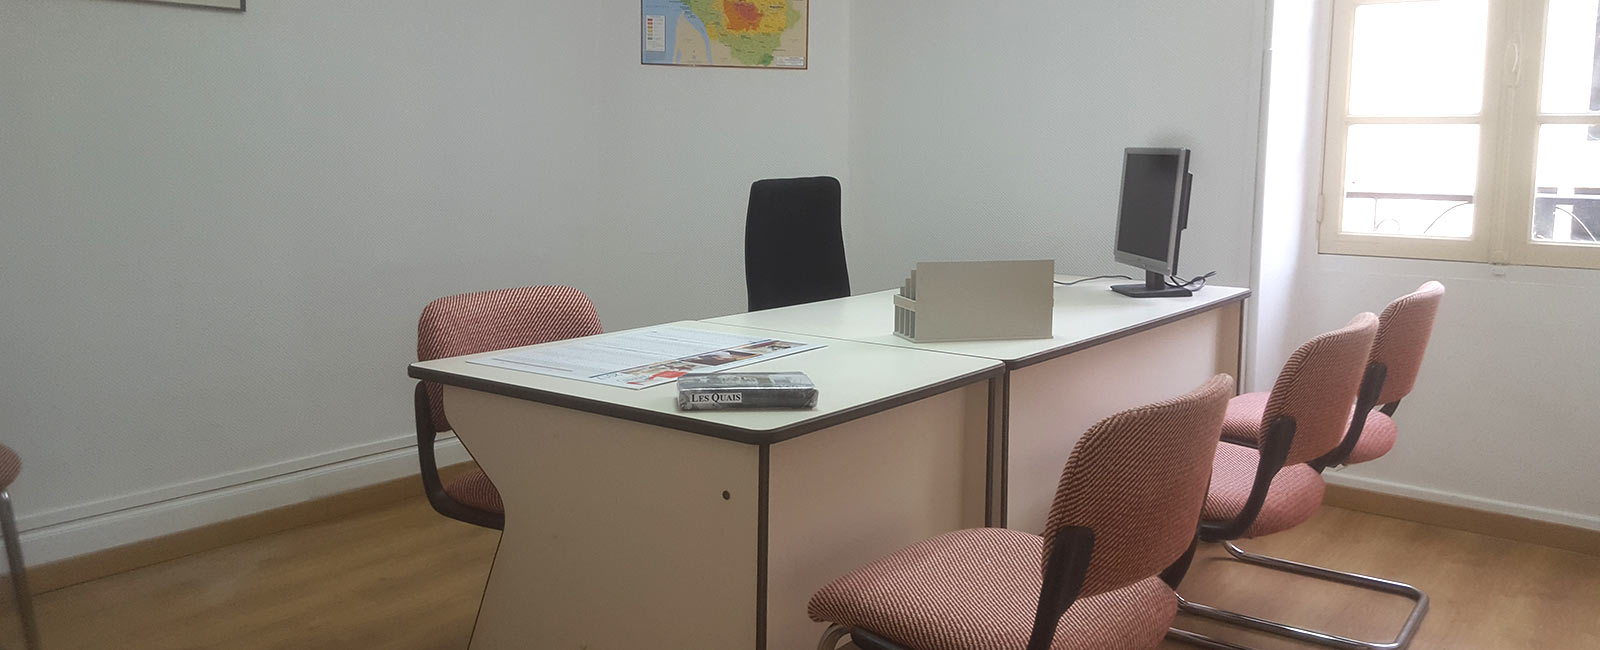 Le-Quai-coworking-angouleme-slider-03